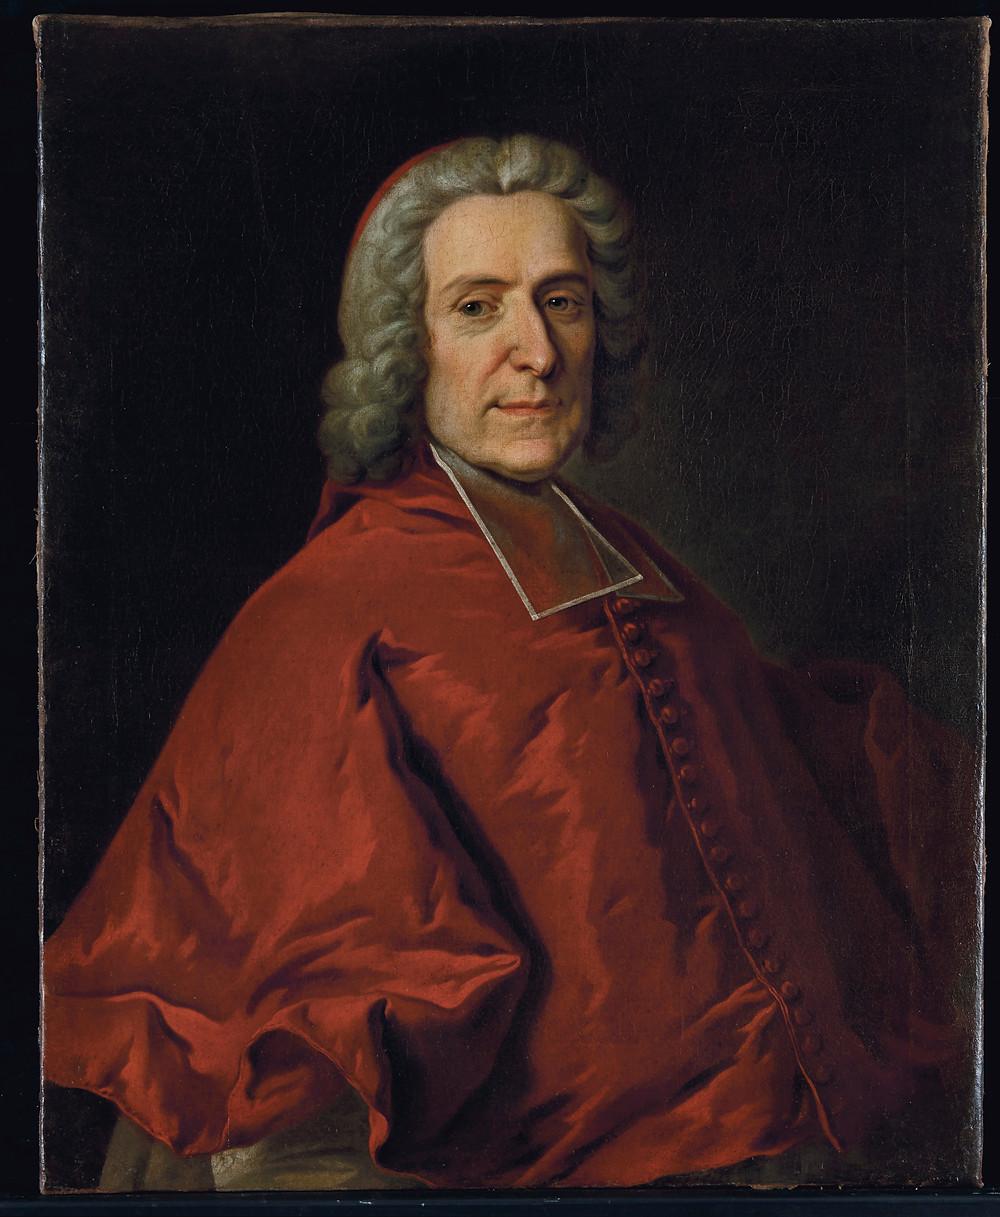 Hyacinthe Rigaud, Portrait de Pierre Paul Guérin, cardinal de Tencin, vers 1739, collection particulière